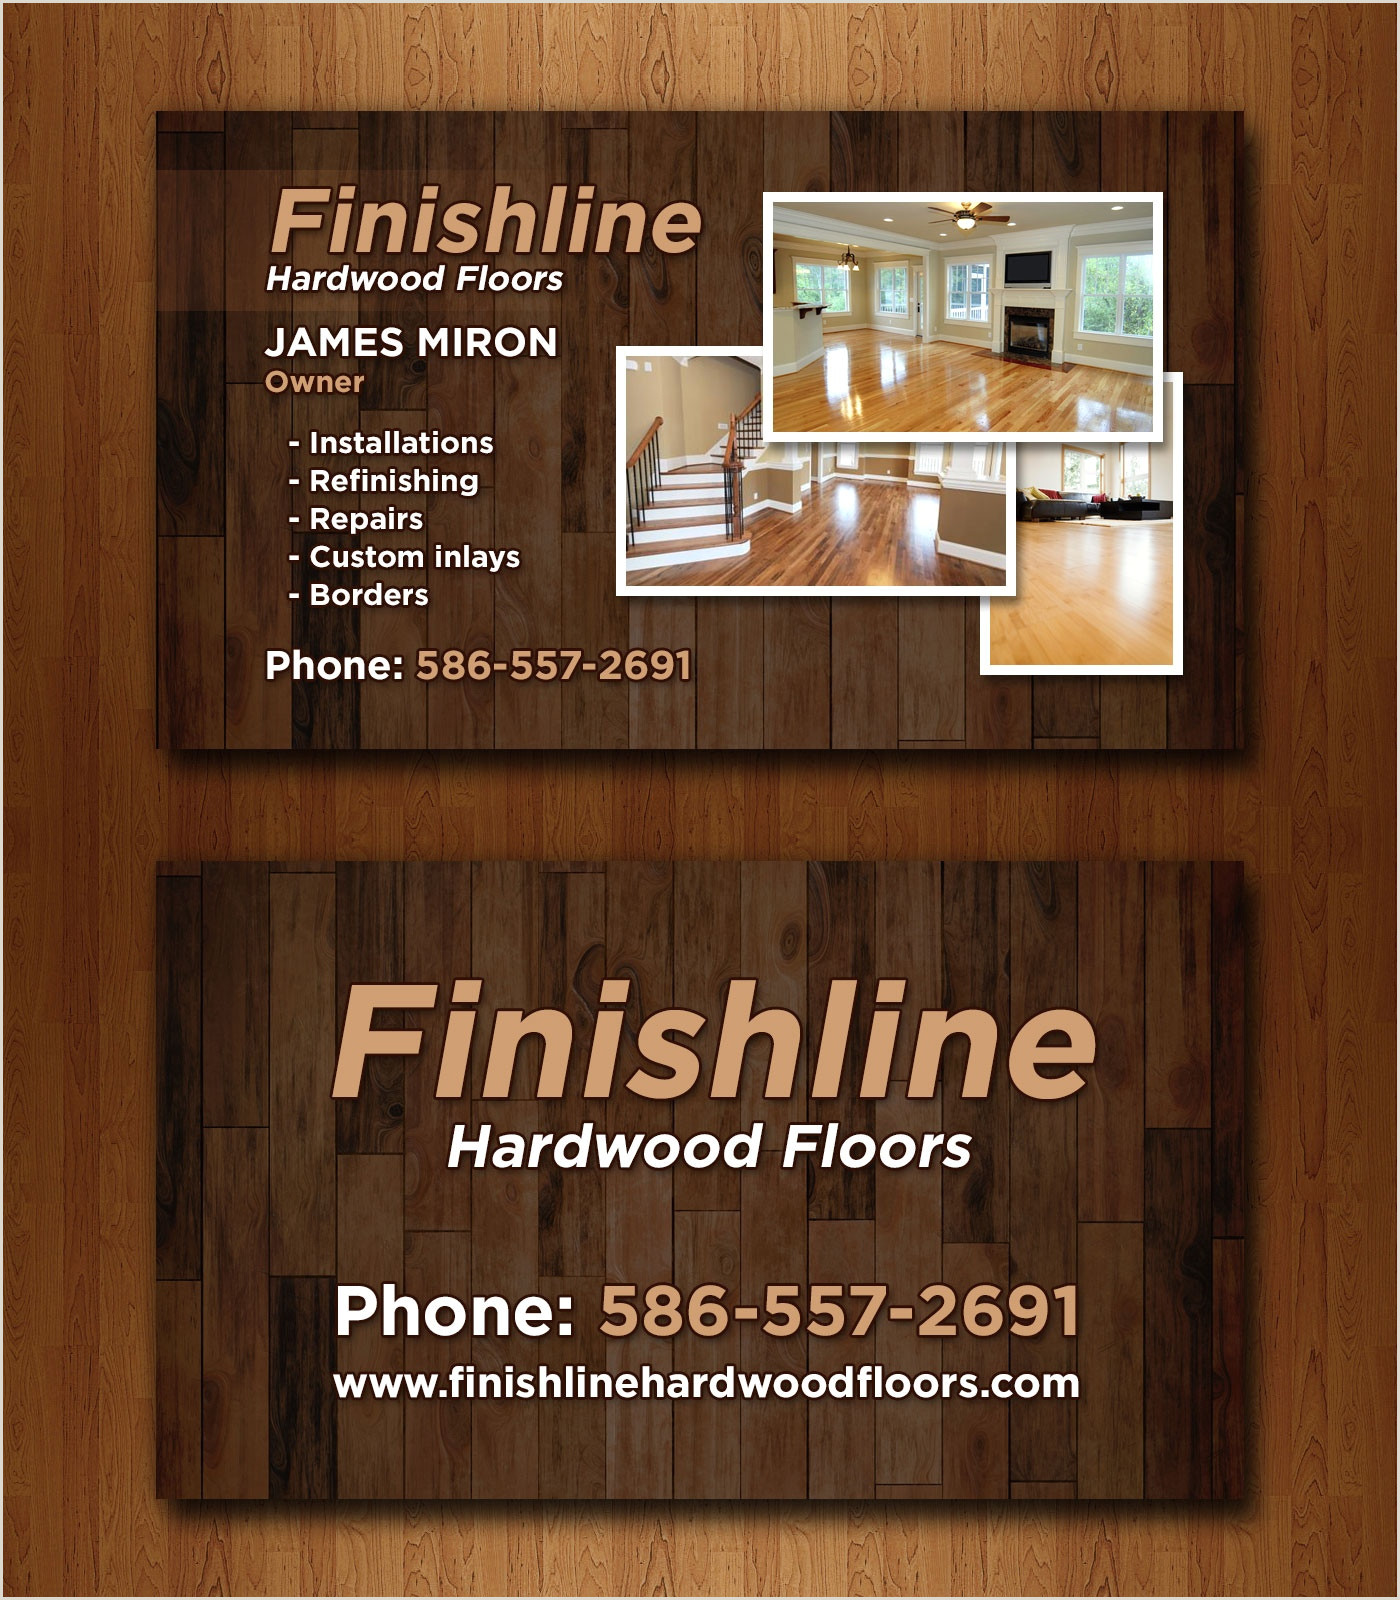 100 Best Business Cards 14 Popular Hardwood Flooring Business Card Template